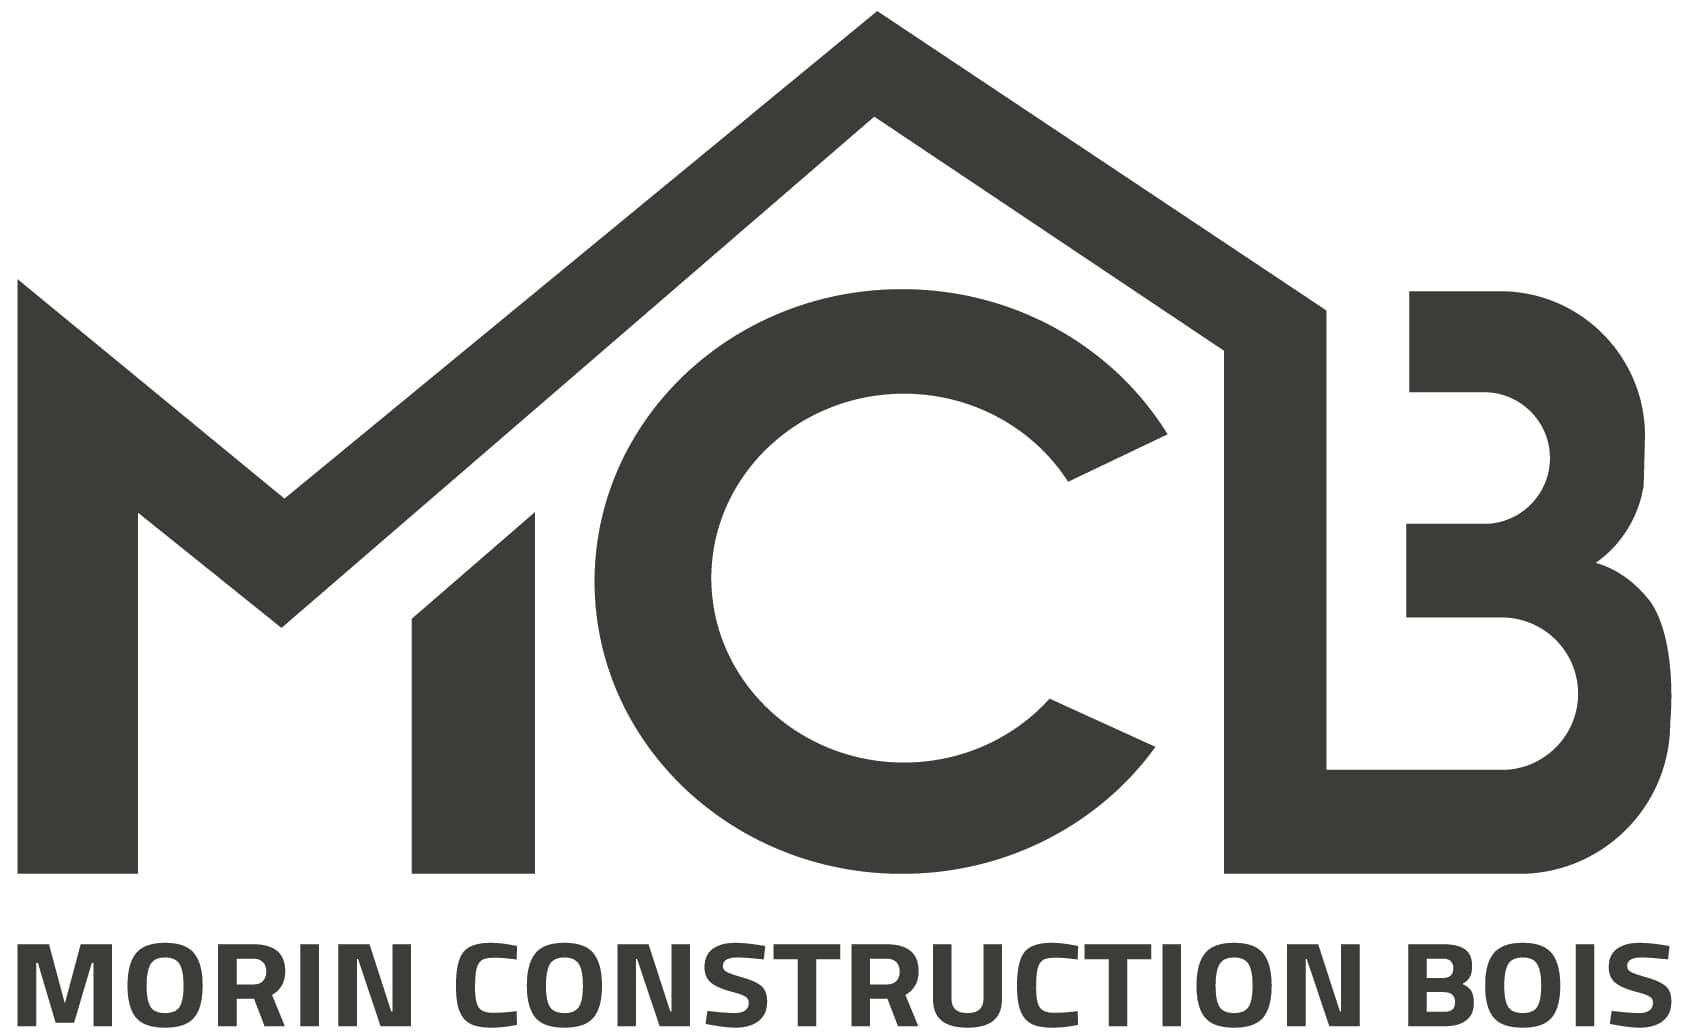 logo-MCB - Morin Construction Bois | Construction Ossature Bois Tiercé